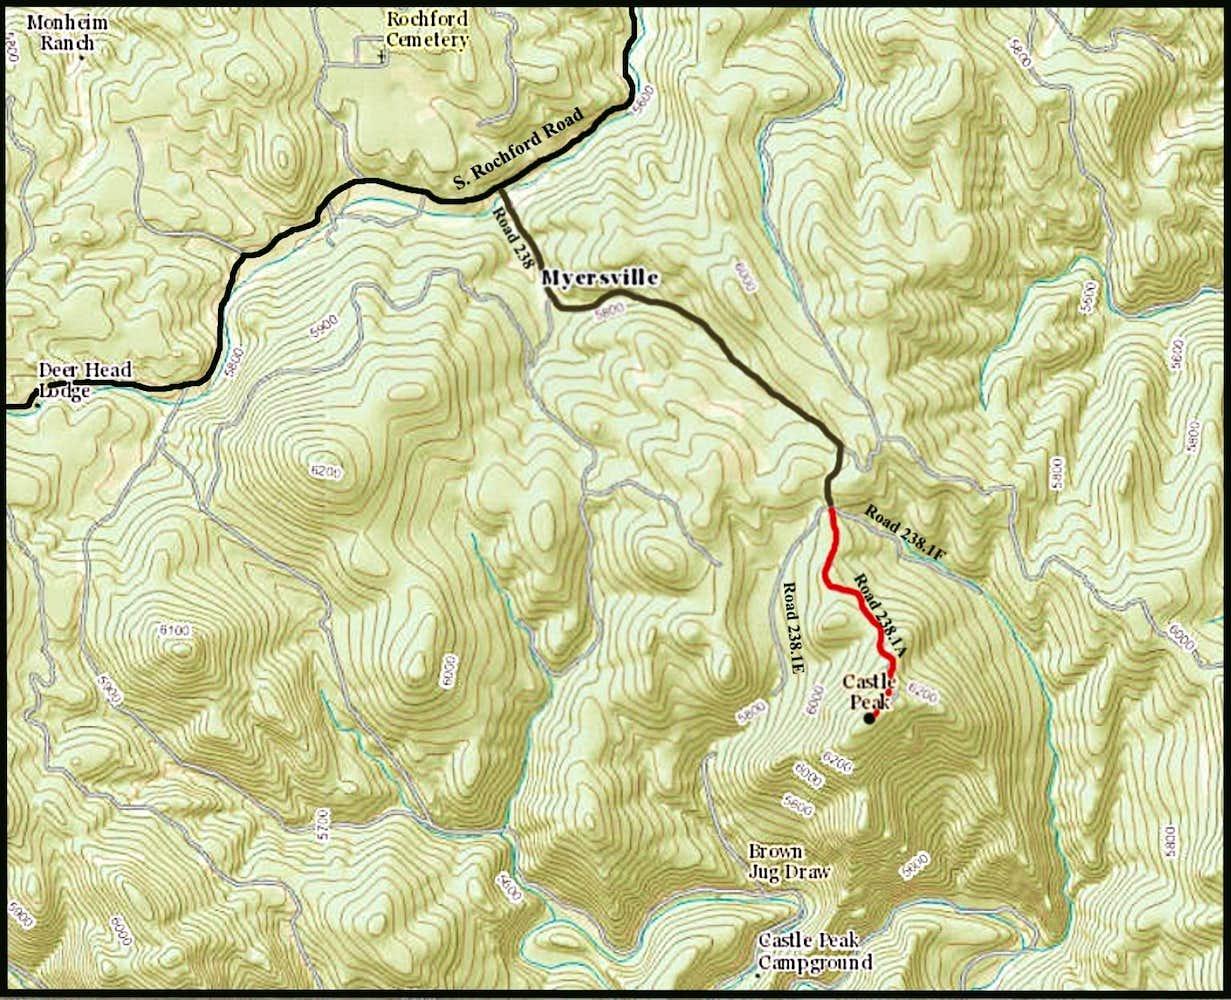 Castle Peak Trail Map : Photos, Diagrams & Topos : SummitPost on